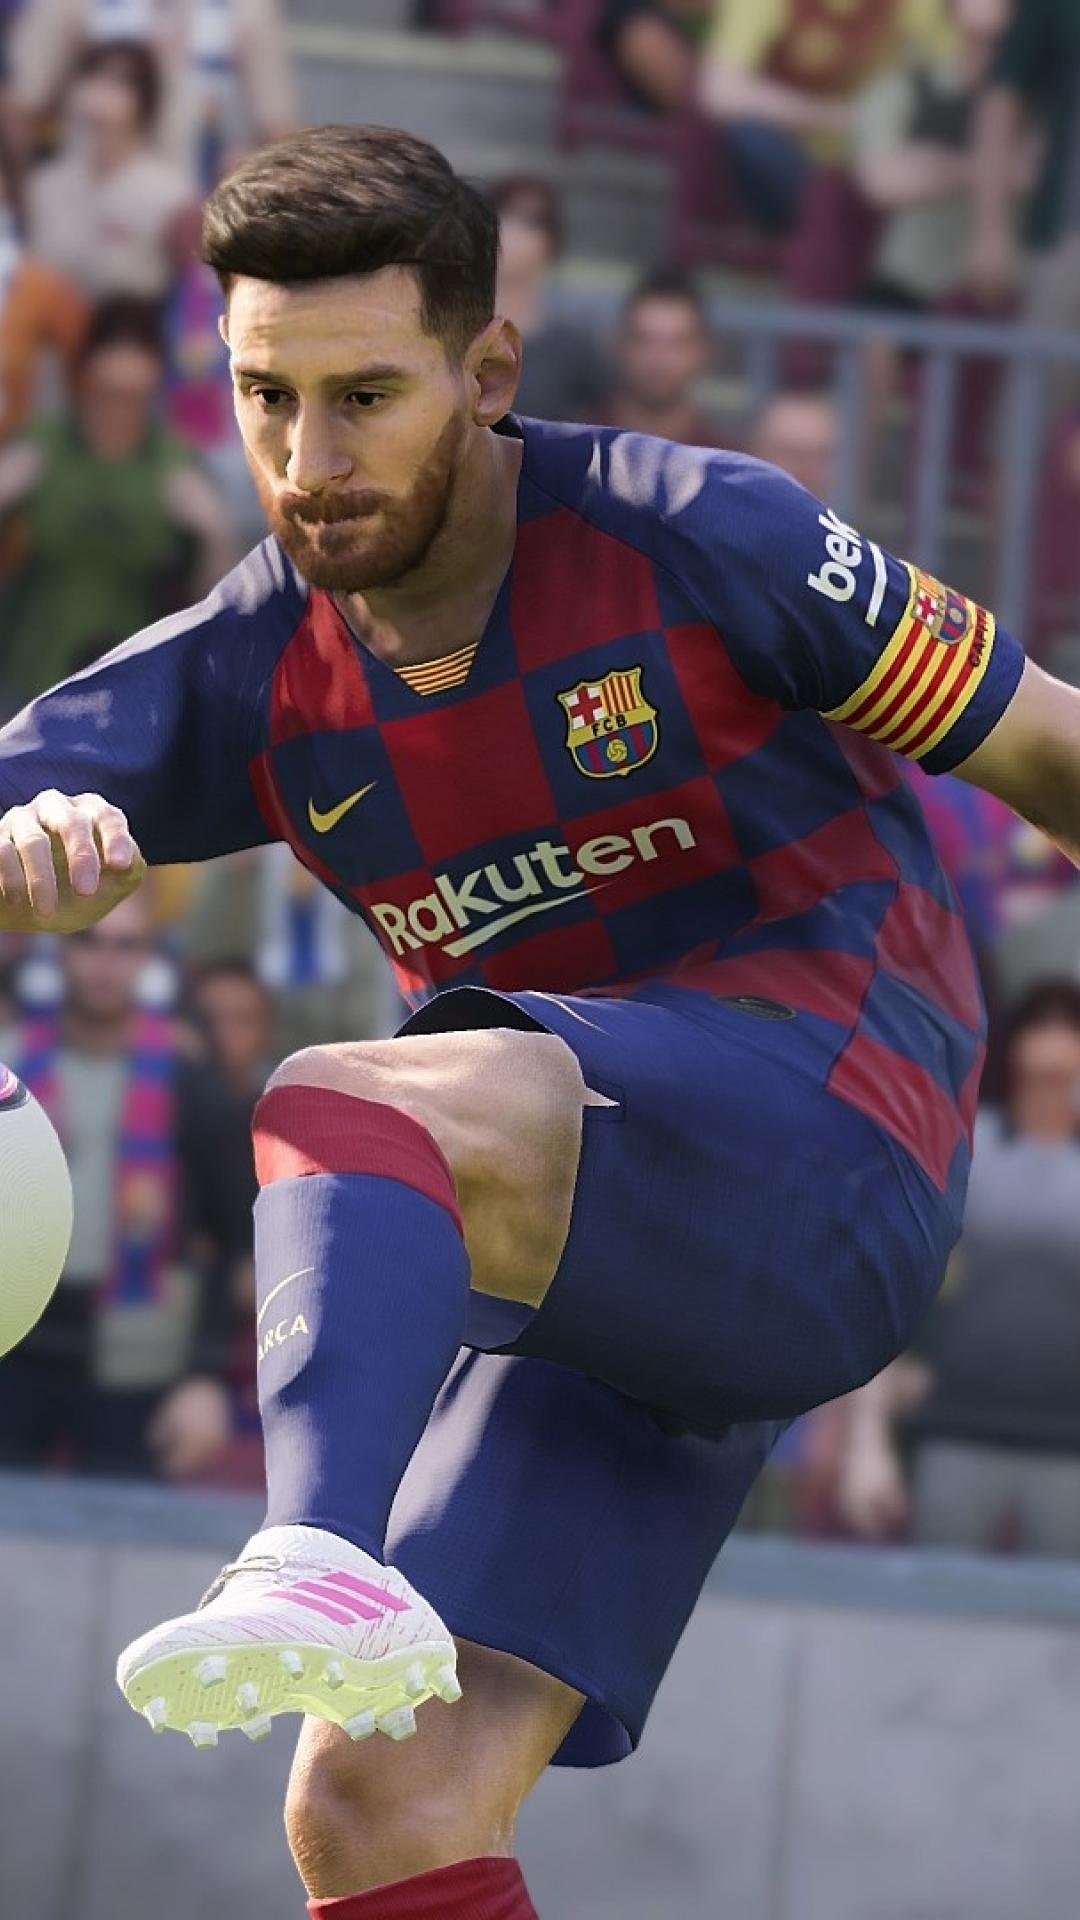 1080x1920 Lionel Messi In eFootball PES 2020 Iphone 7 6s 6 Plus 1080x1920